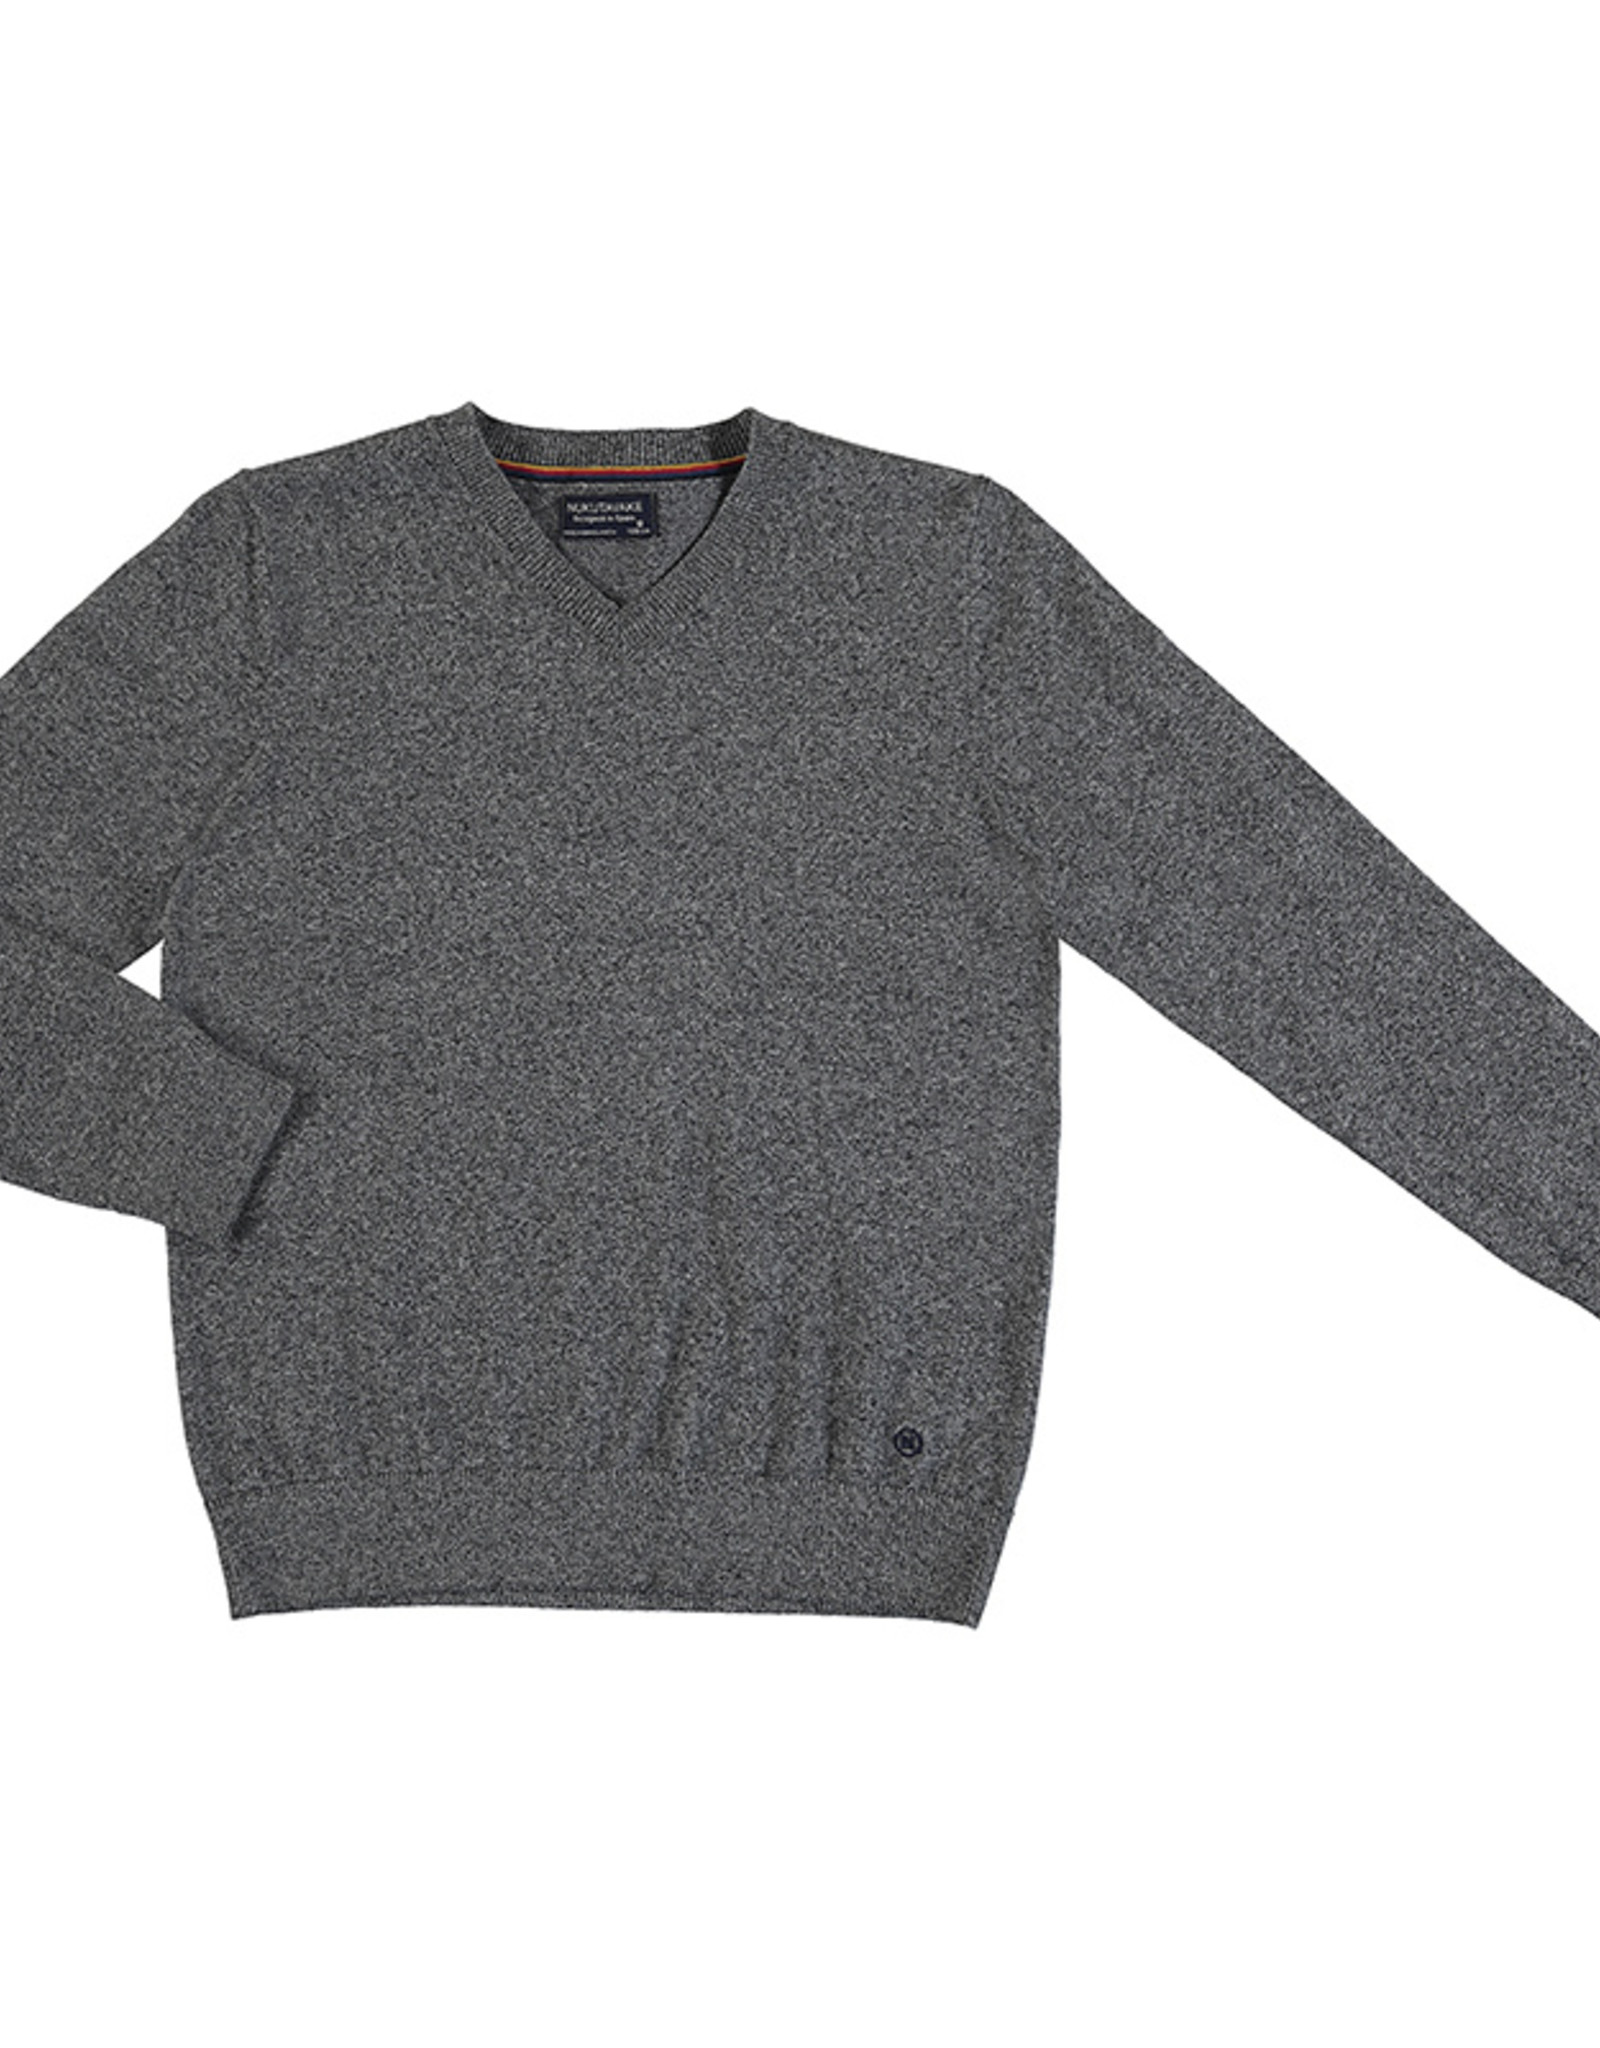 Mayoral Big Boys Heather Grey V-neck Sweater